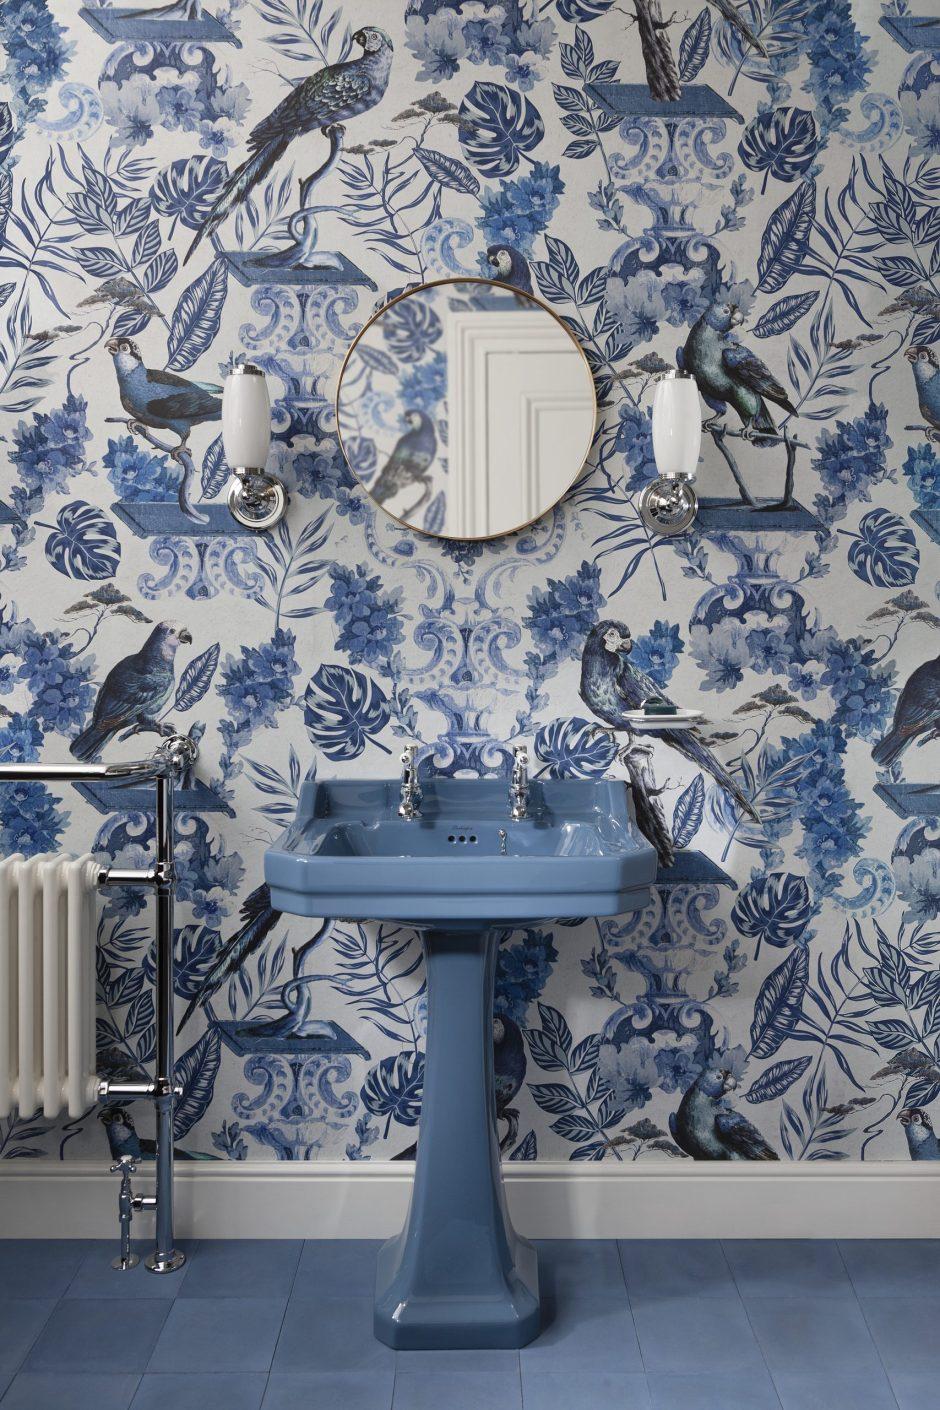 Burlington Bespoke Handcrafted Bathroom Ceramics/Sanitaryware